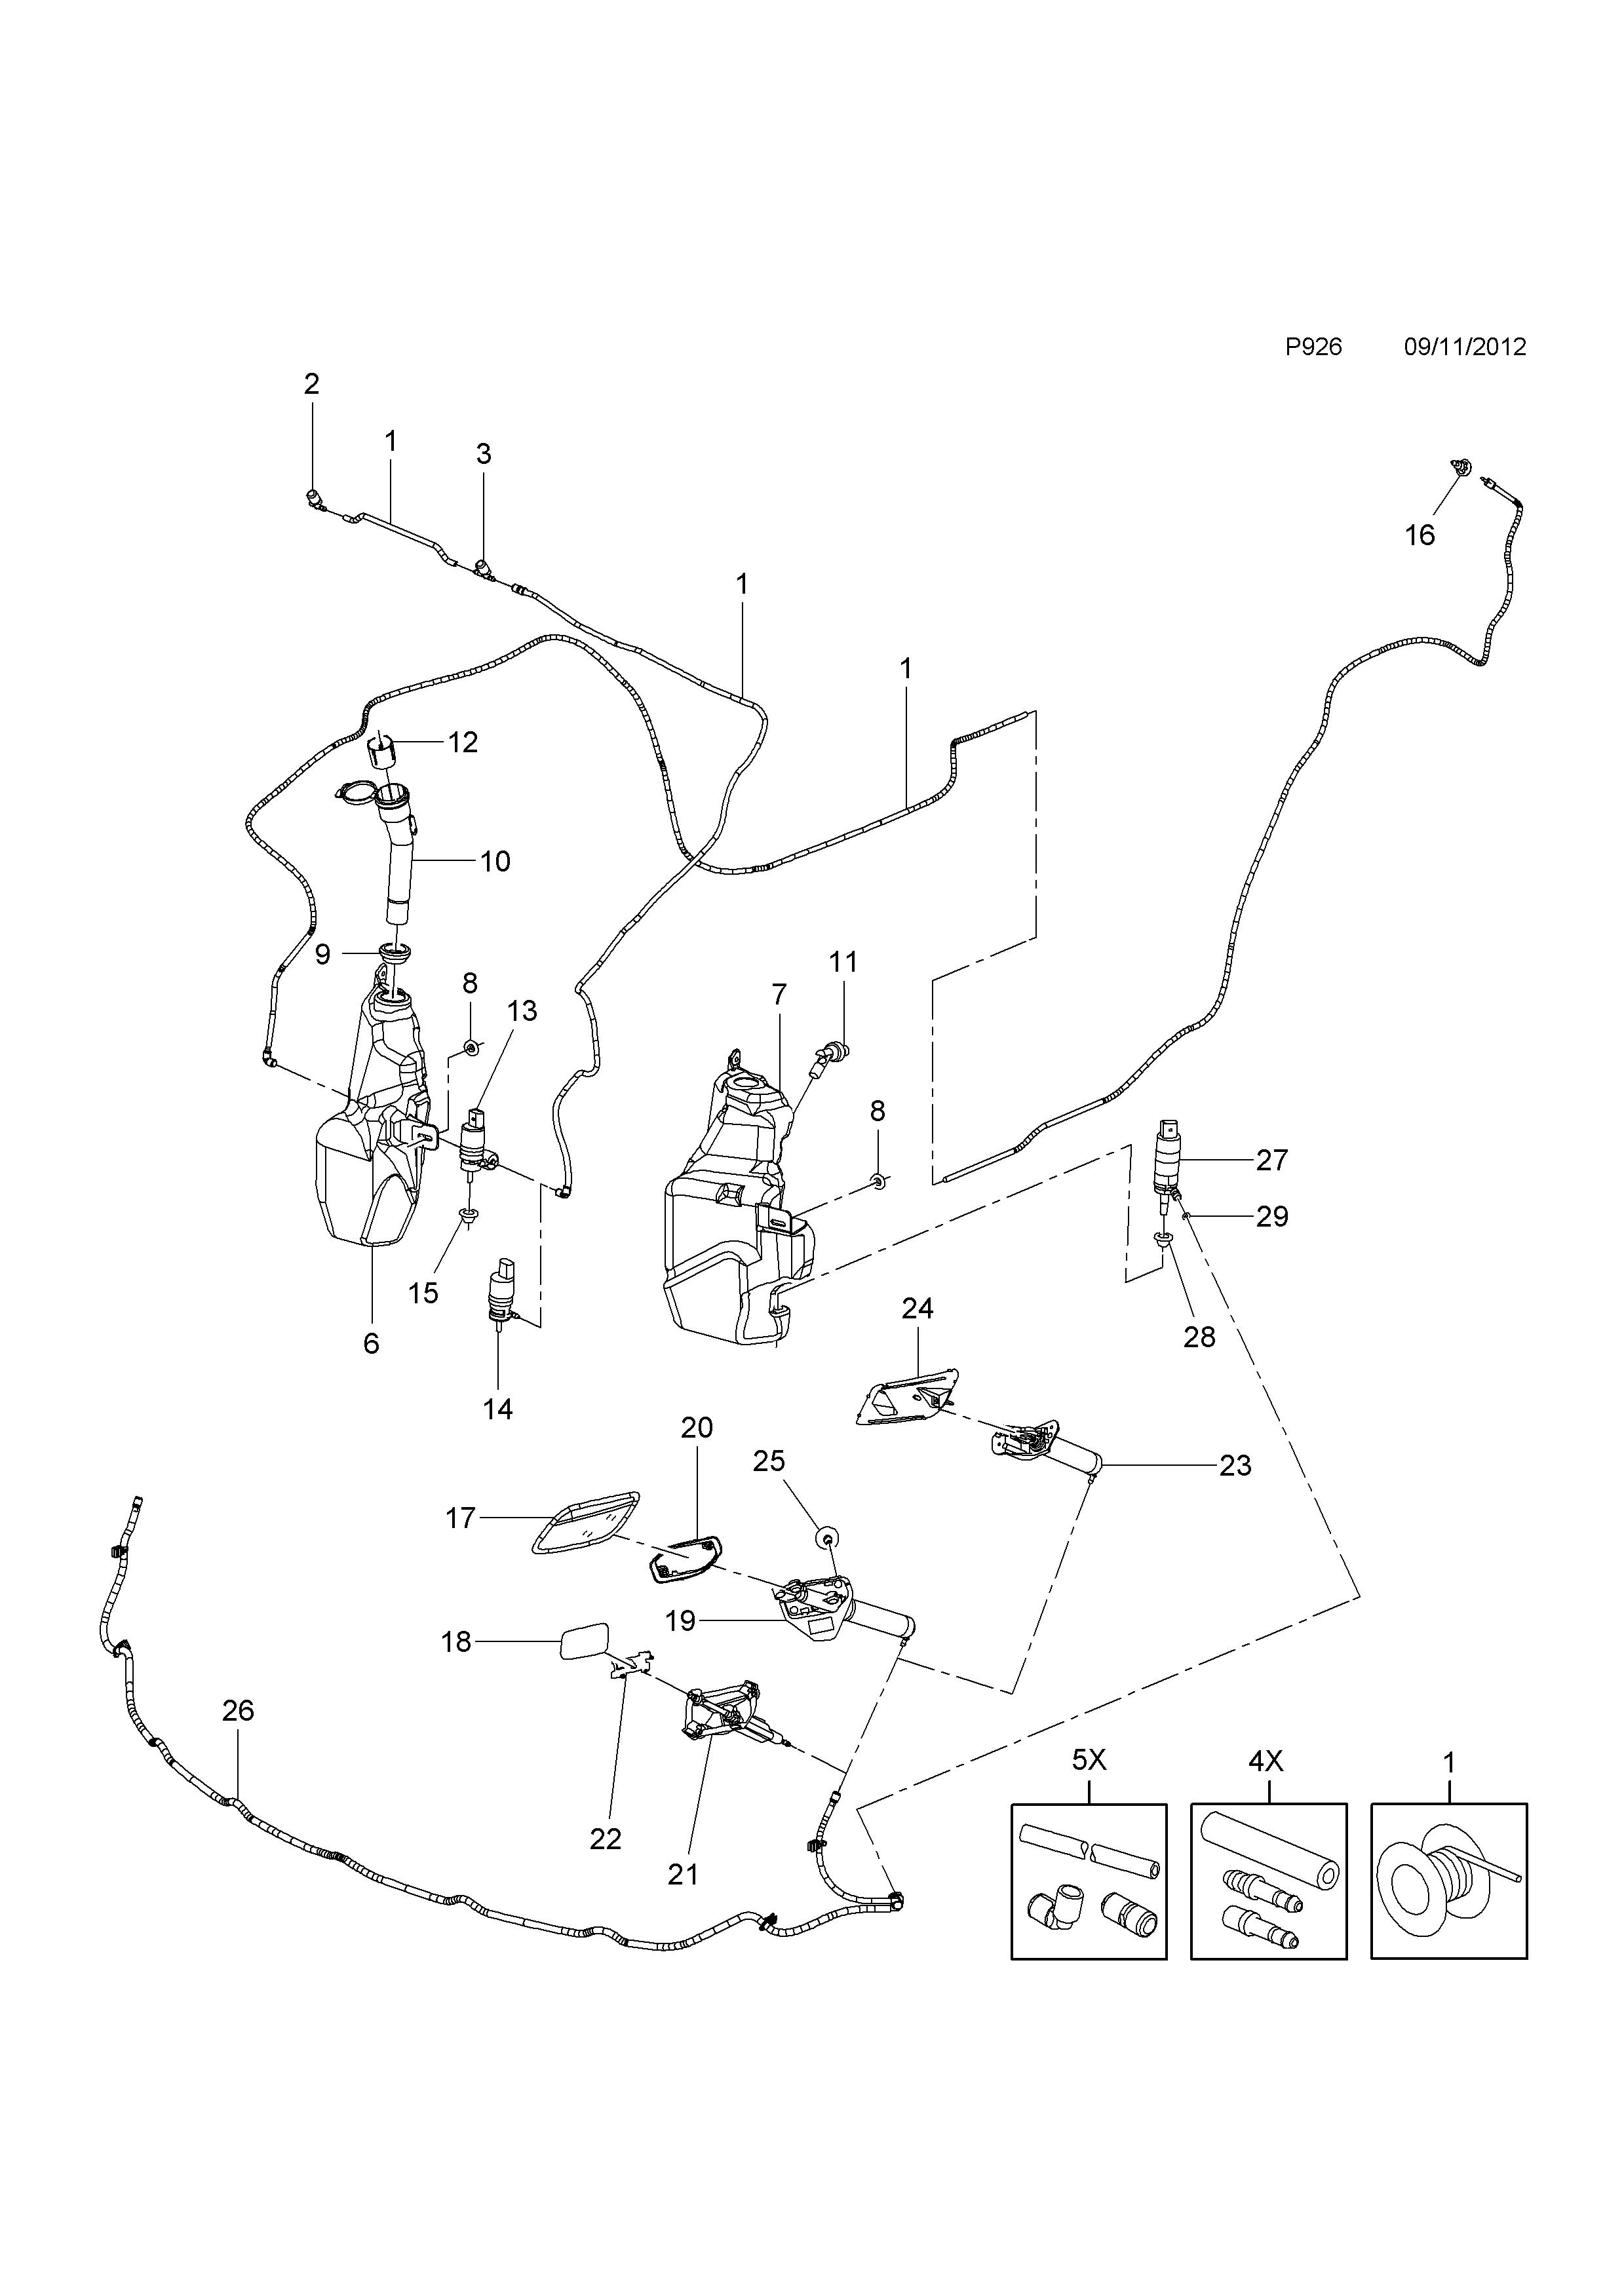 astra j w0lpf6ej7bg130688 p electrical 229 windscreen headl Wiper Wiring Diagram list of parts